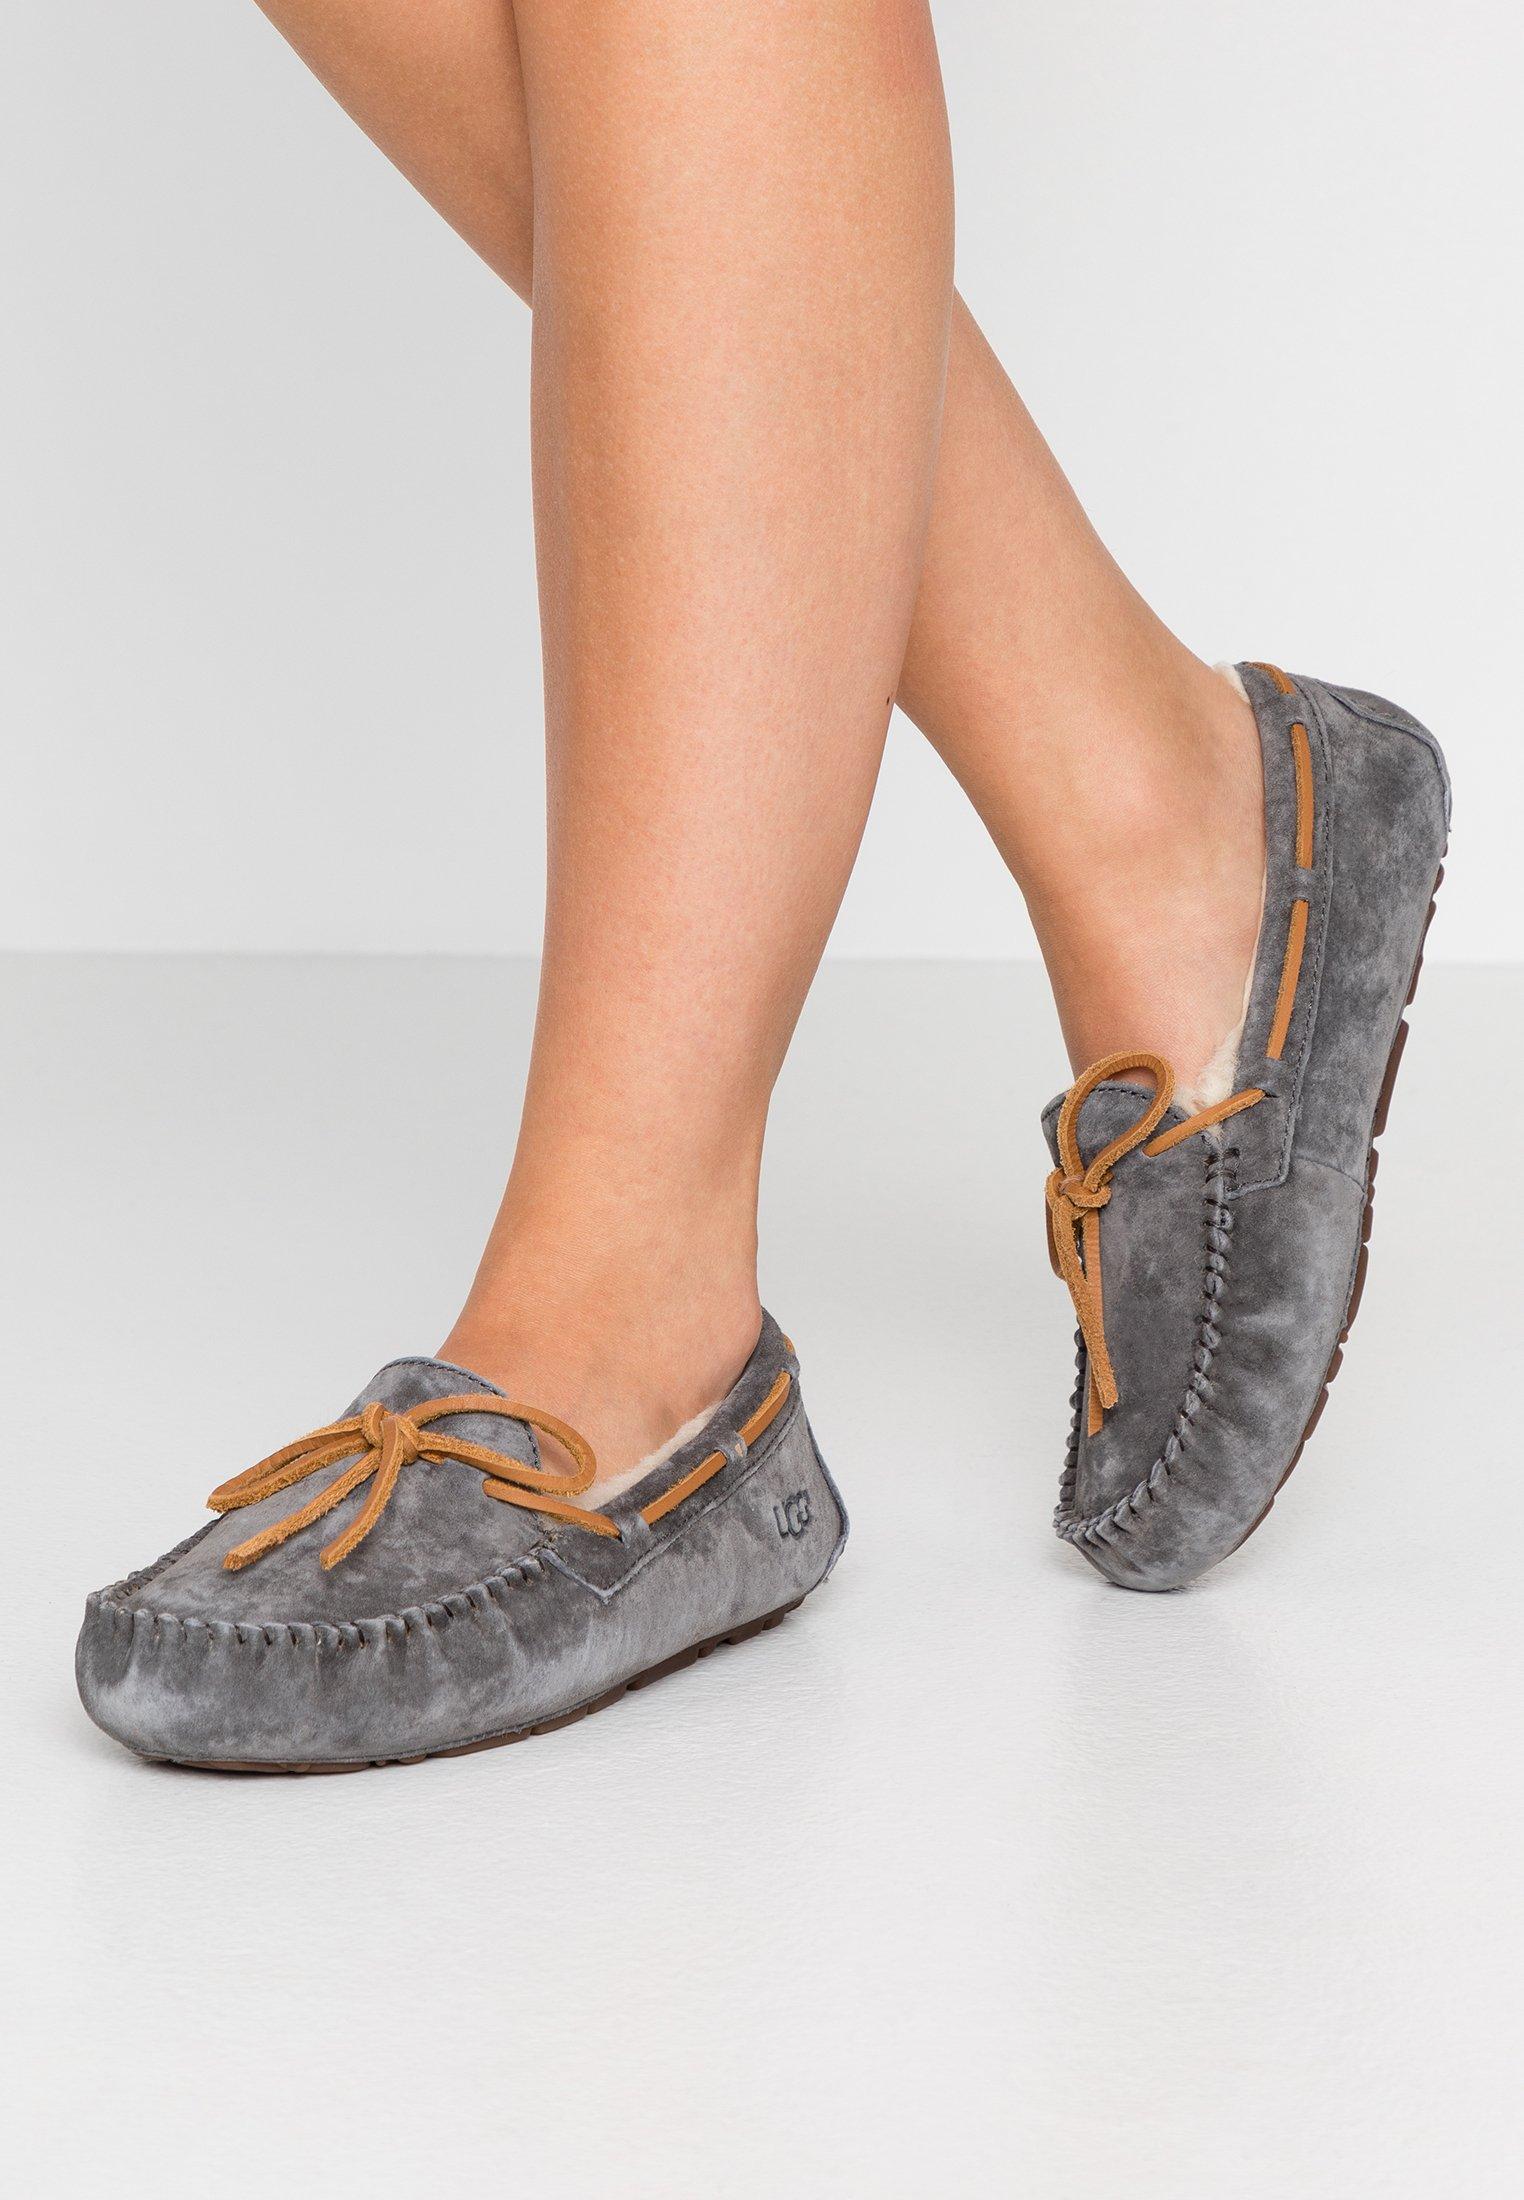 chaussons ugg femme dakota